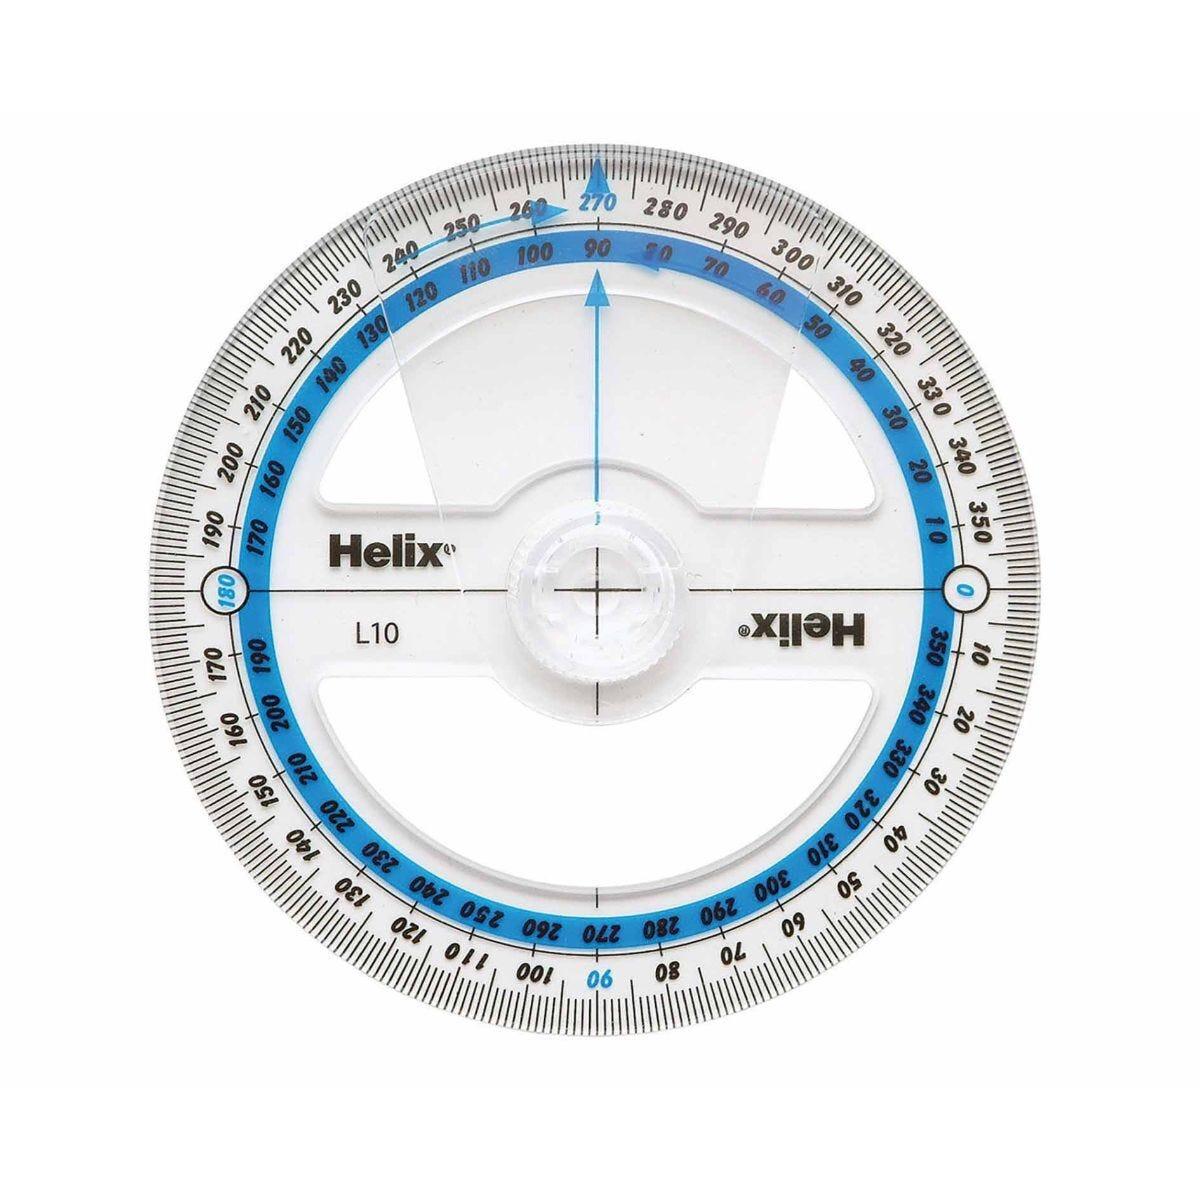 Helix Angle Measure 360 Degree